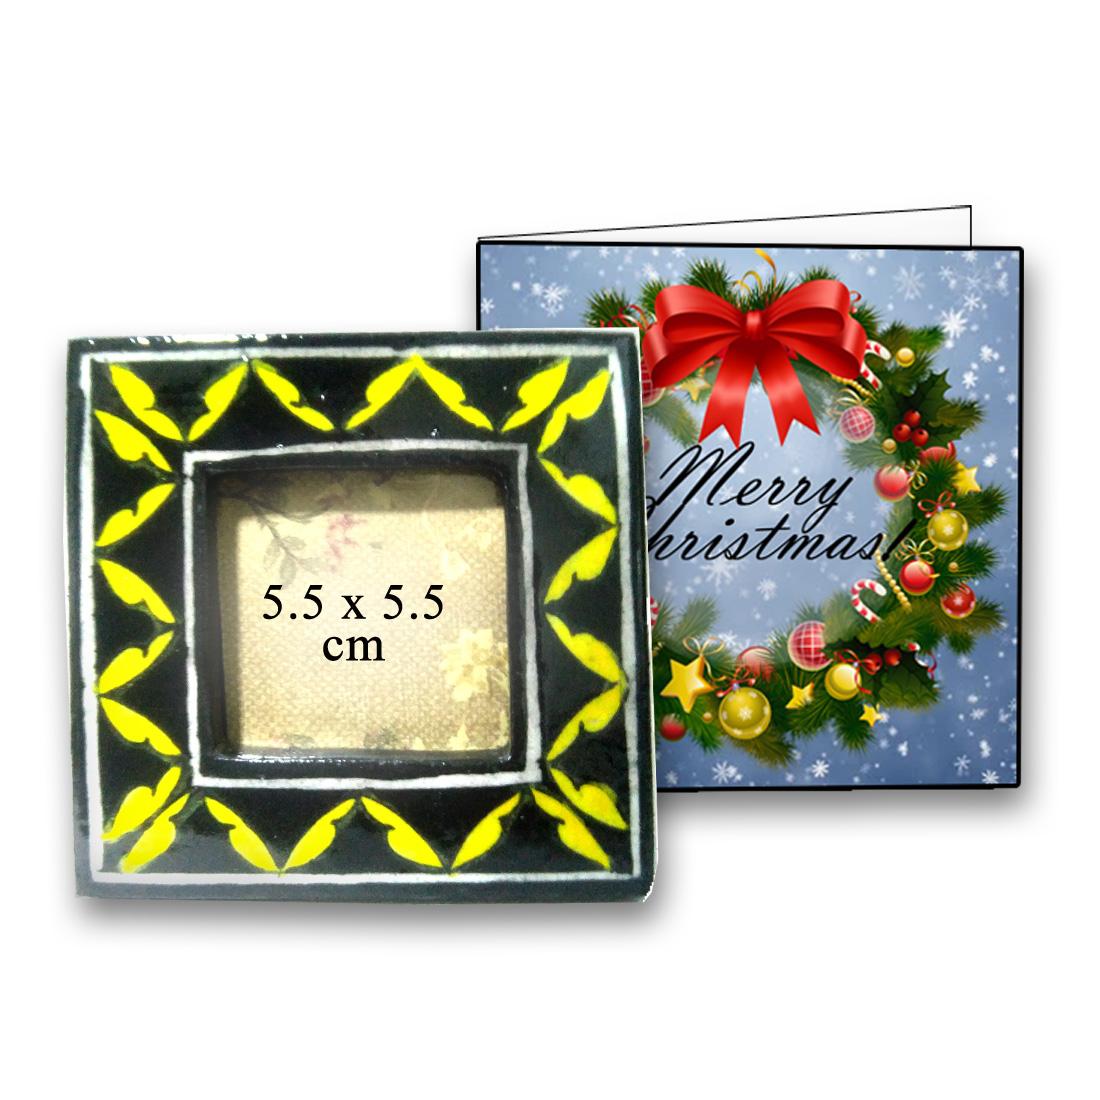 CHRISTMAS COMBO DESKTOP PHOTO FRAME AND GREETING CARD (SMALL)